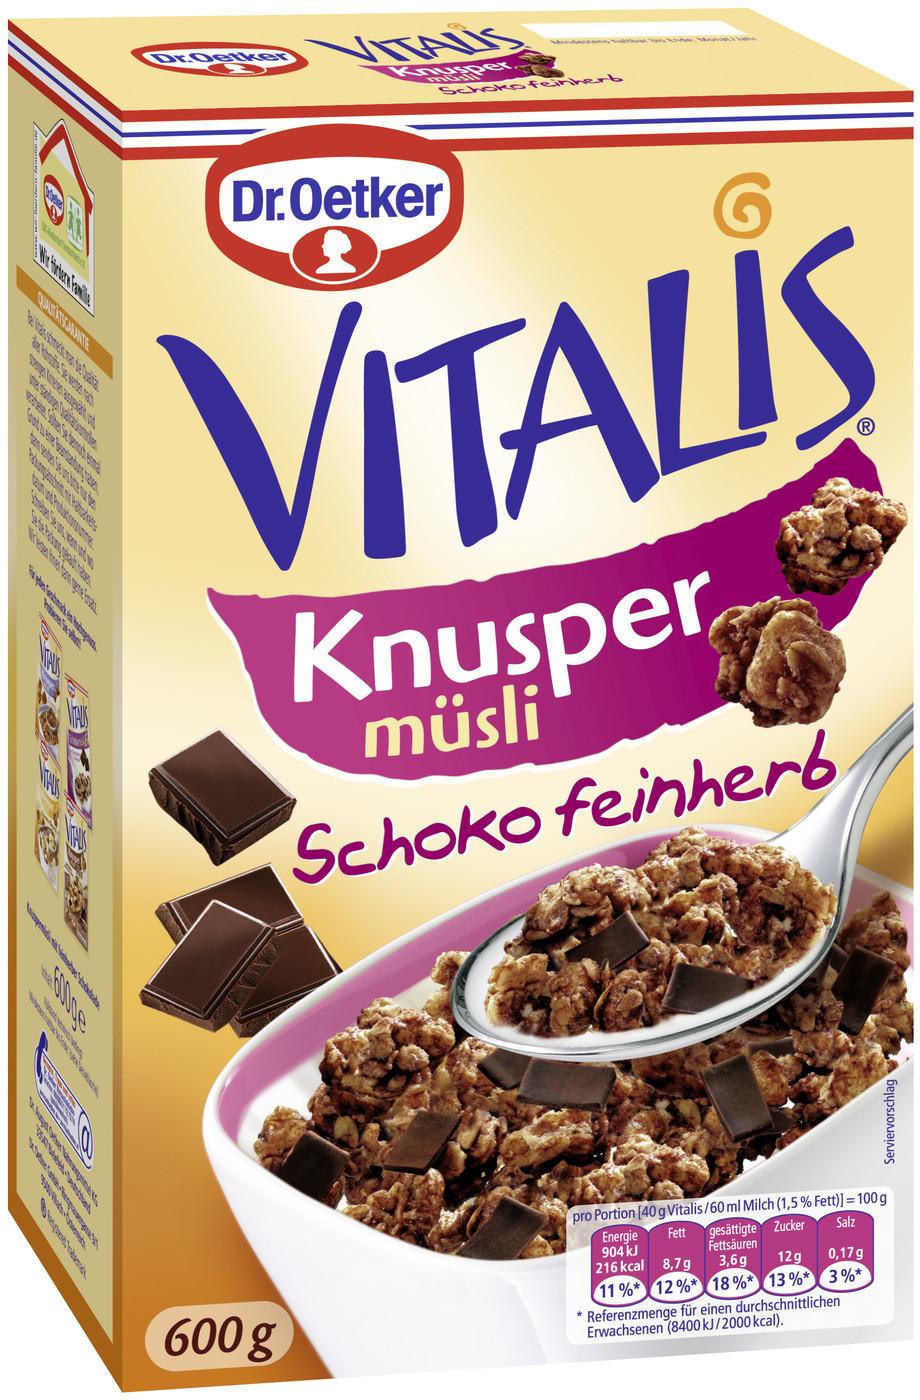 Dr. Oetker Vitalis Knusper Schoko Feinherb (600 g)